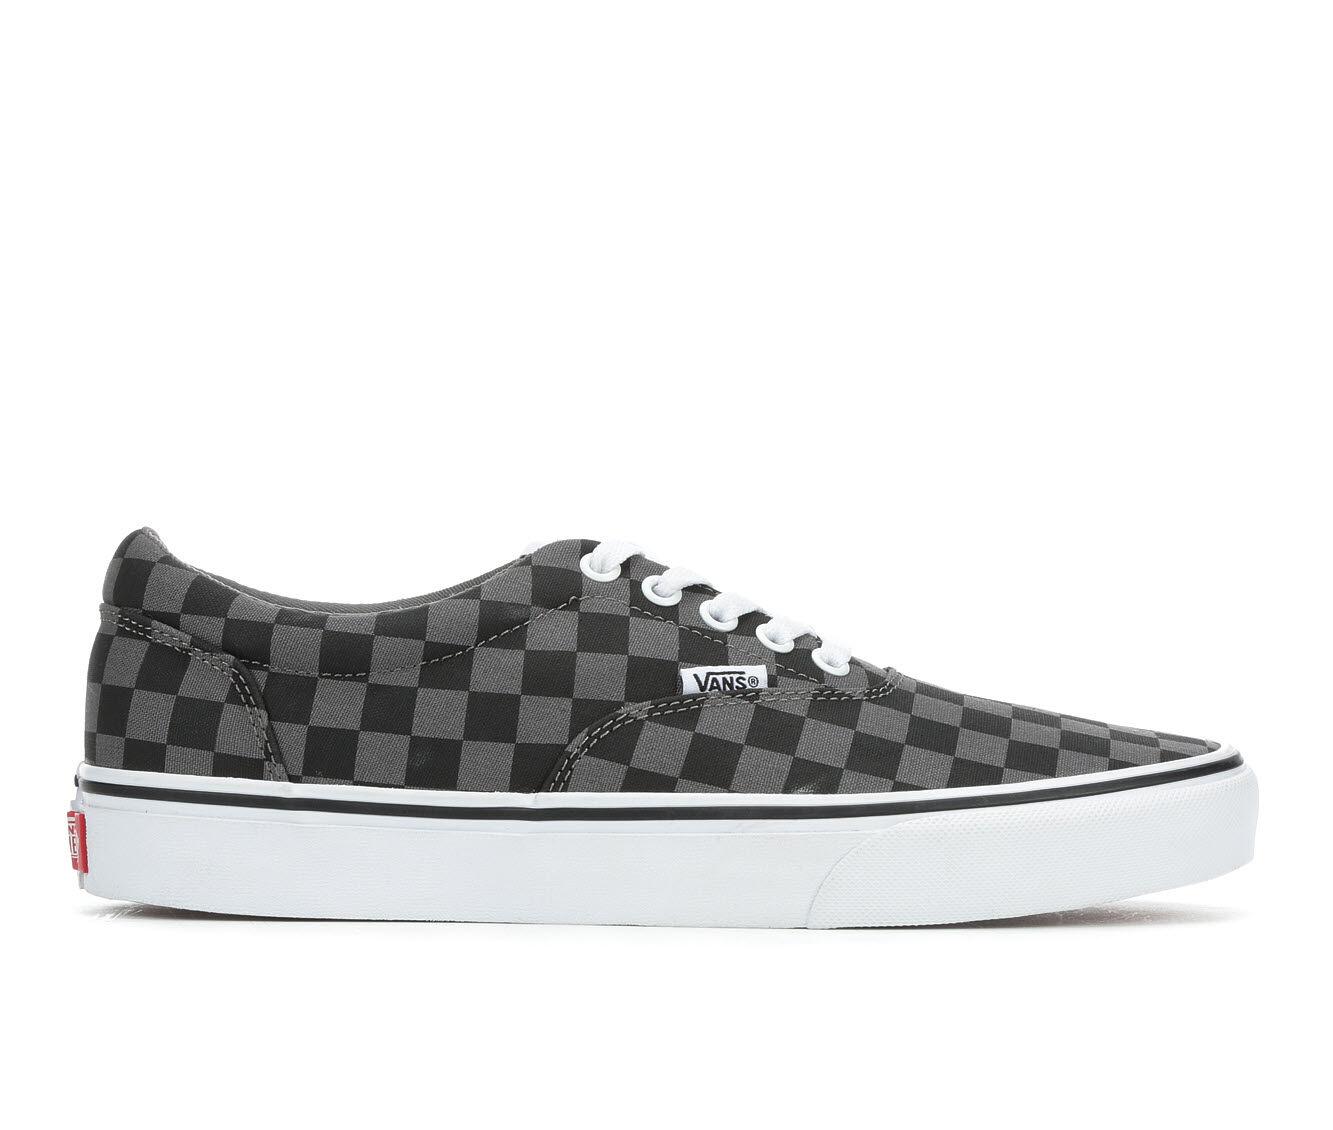 Buy Cheap Men's Vans Doheny Skate Shoes Black/Grey Chec